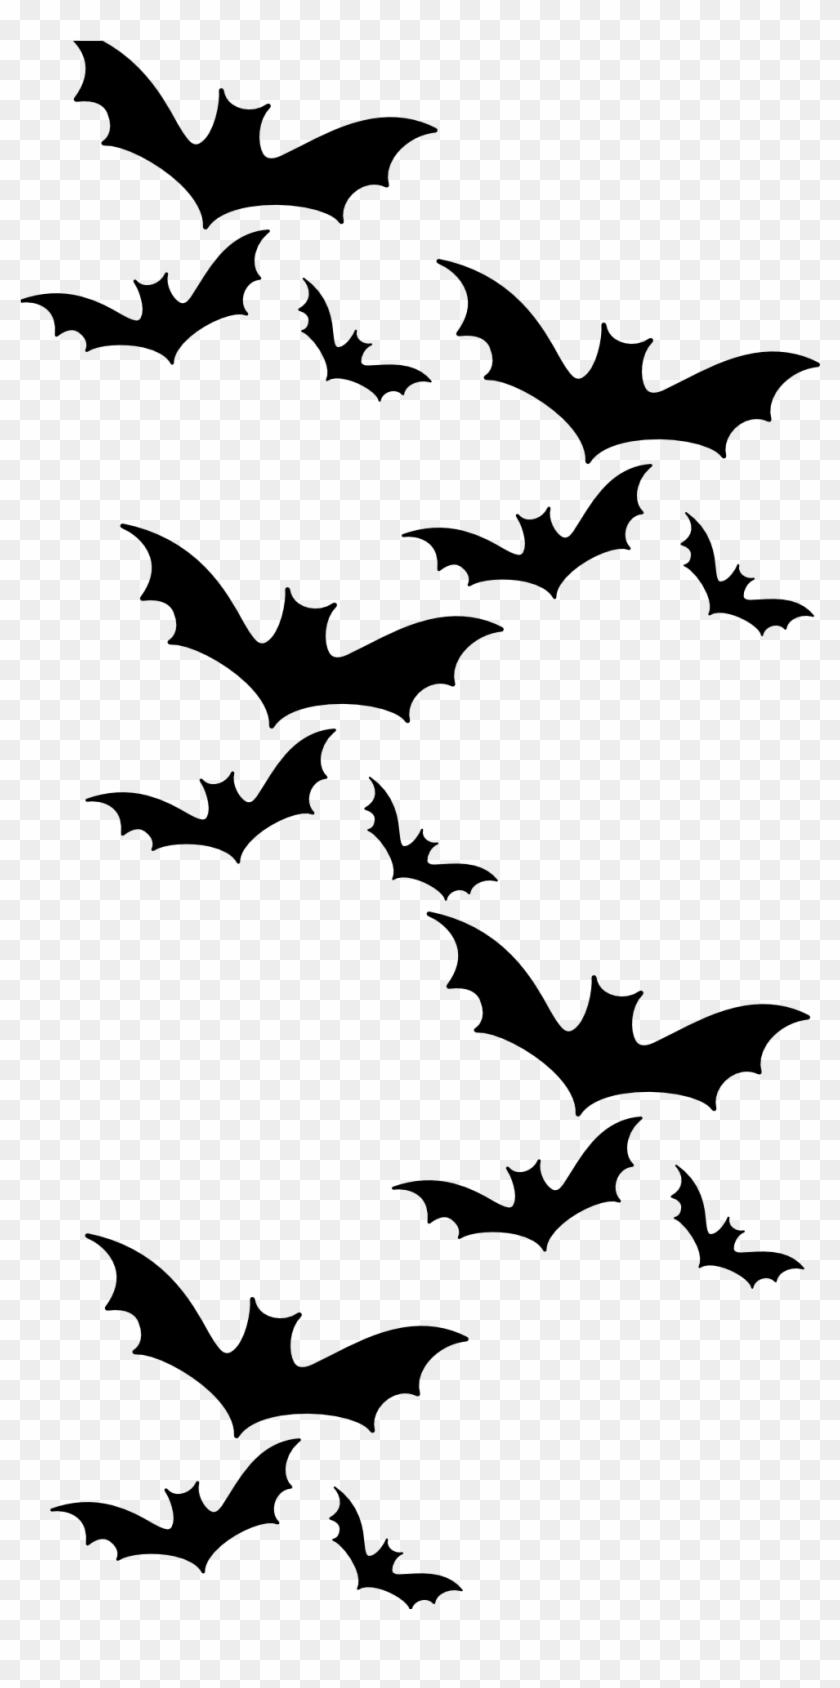 Halloween Vintage Clipart.Bat Beak Flora Fauna Clip Art Vintage Schlager Halloween Party